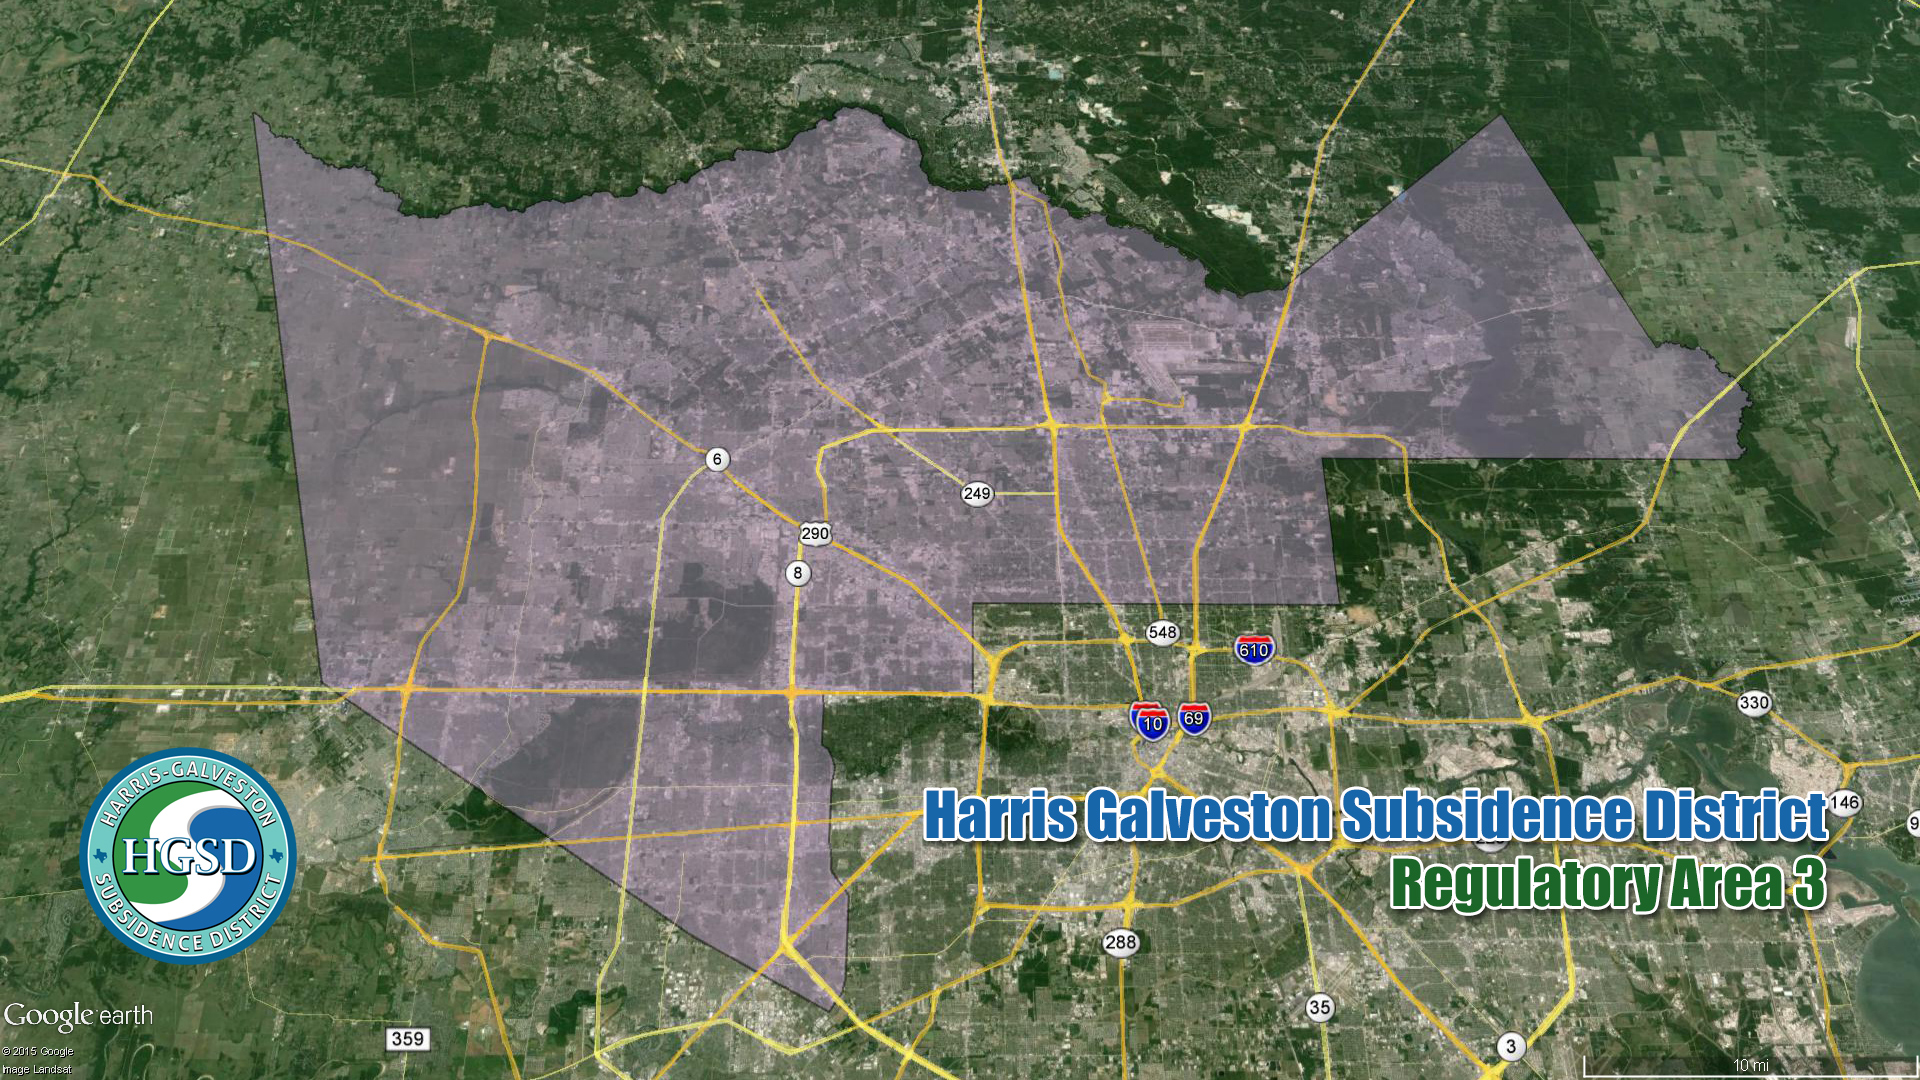 subsidence HGSD regulatory area 3